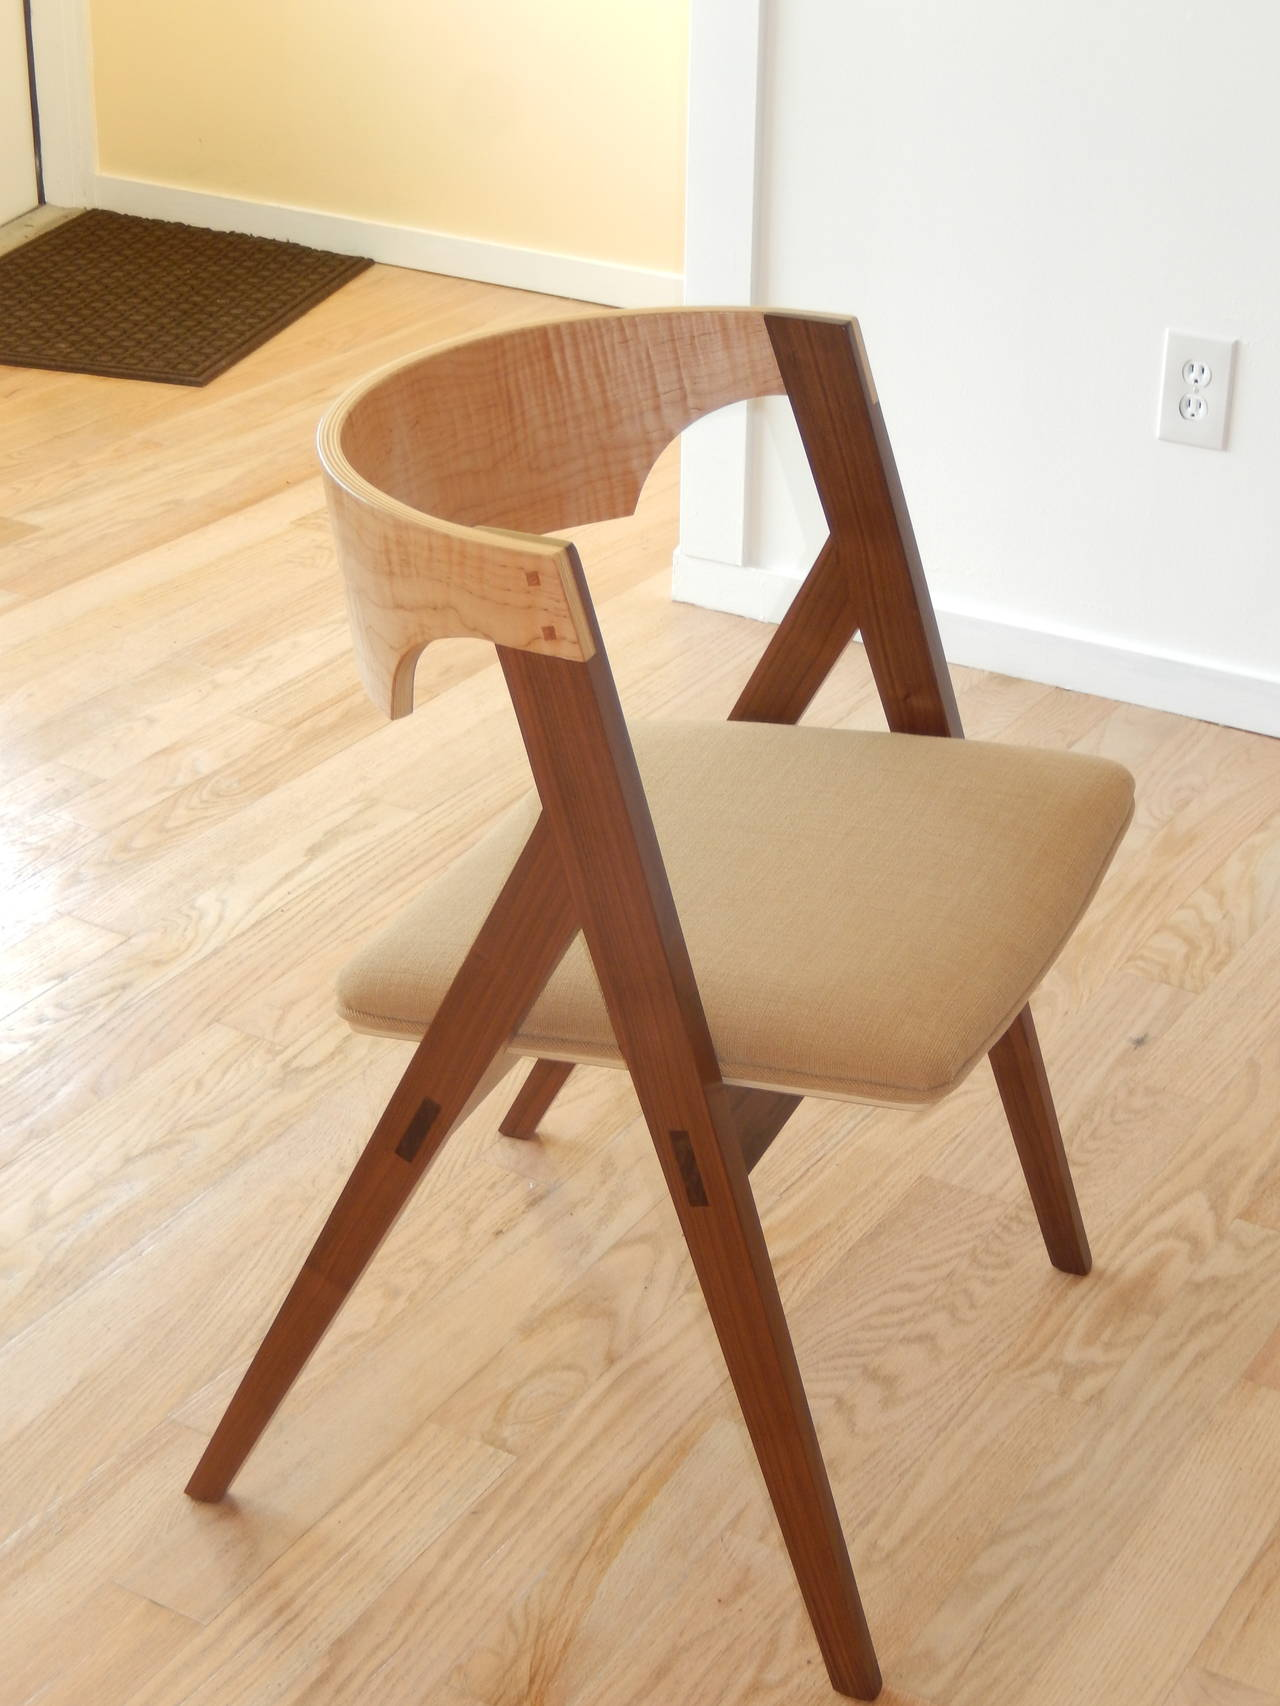 American Craftsman David N Ebner's Dining Room or Desk Chair For Sale